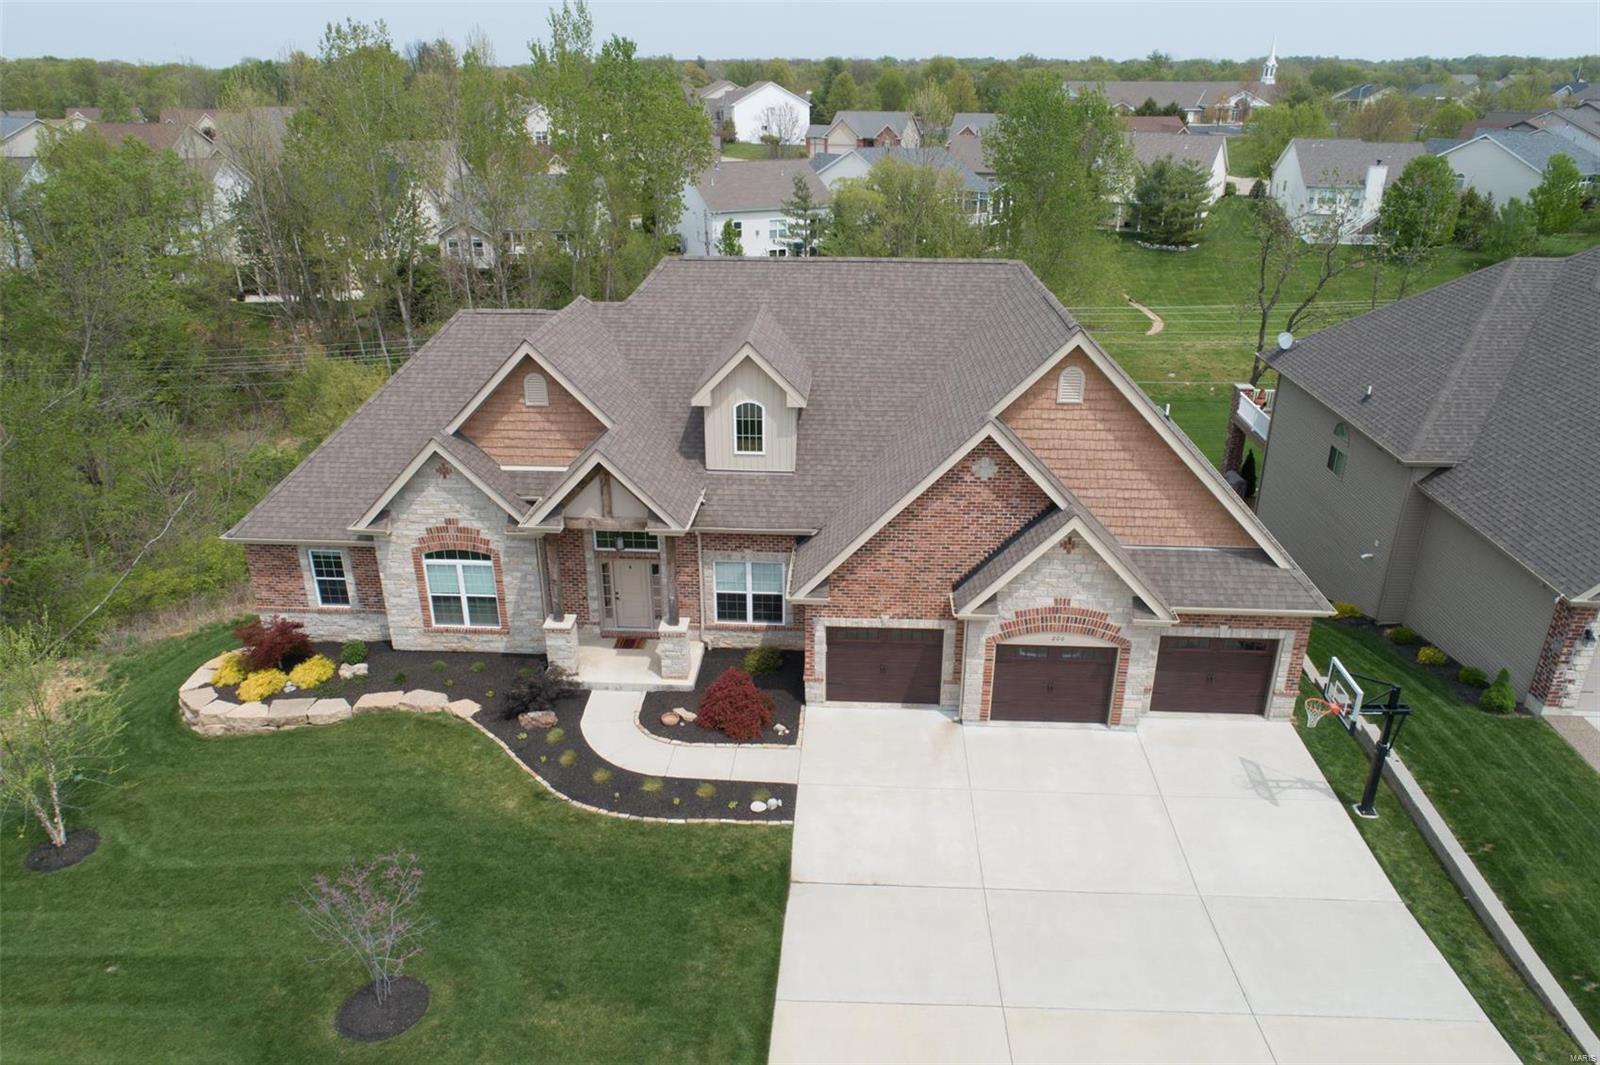 206 Rue De Vin Property Photo - Lake St Louis, MO real estate listing